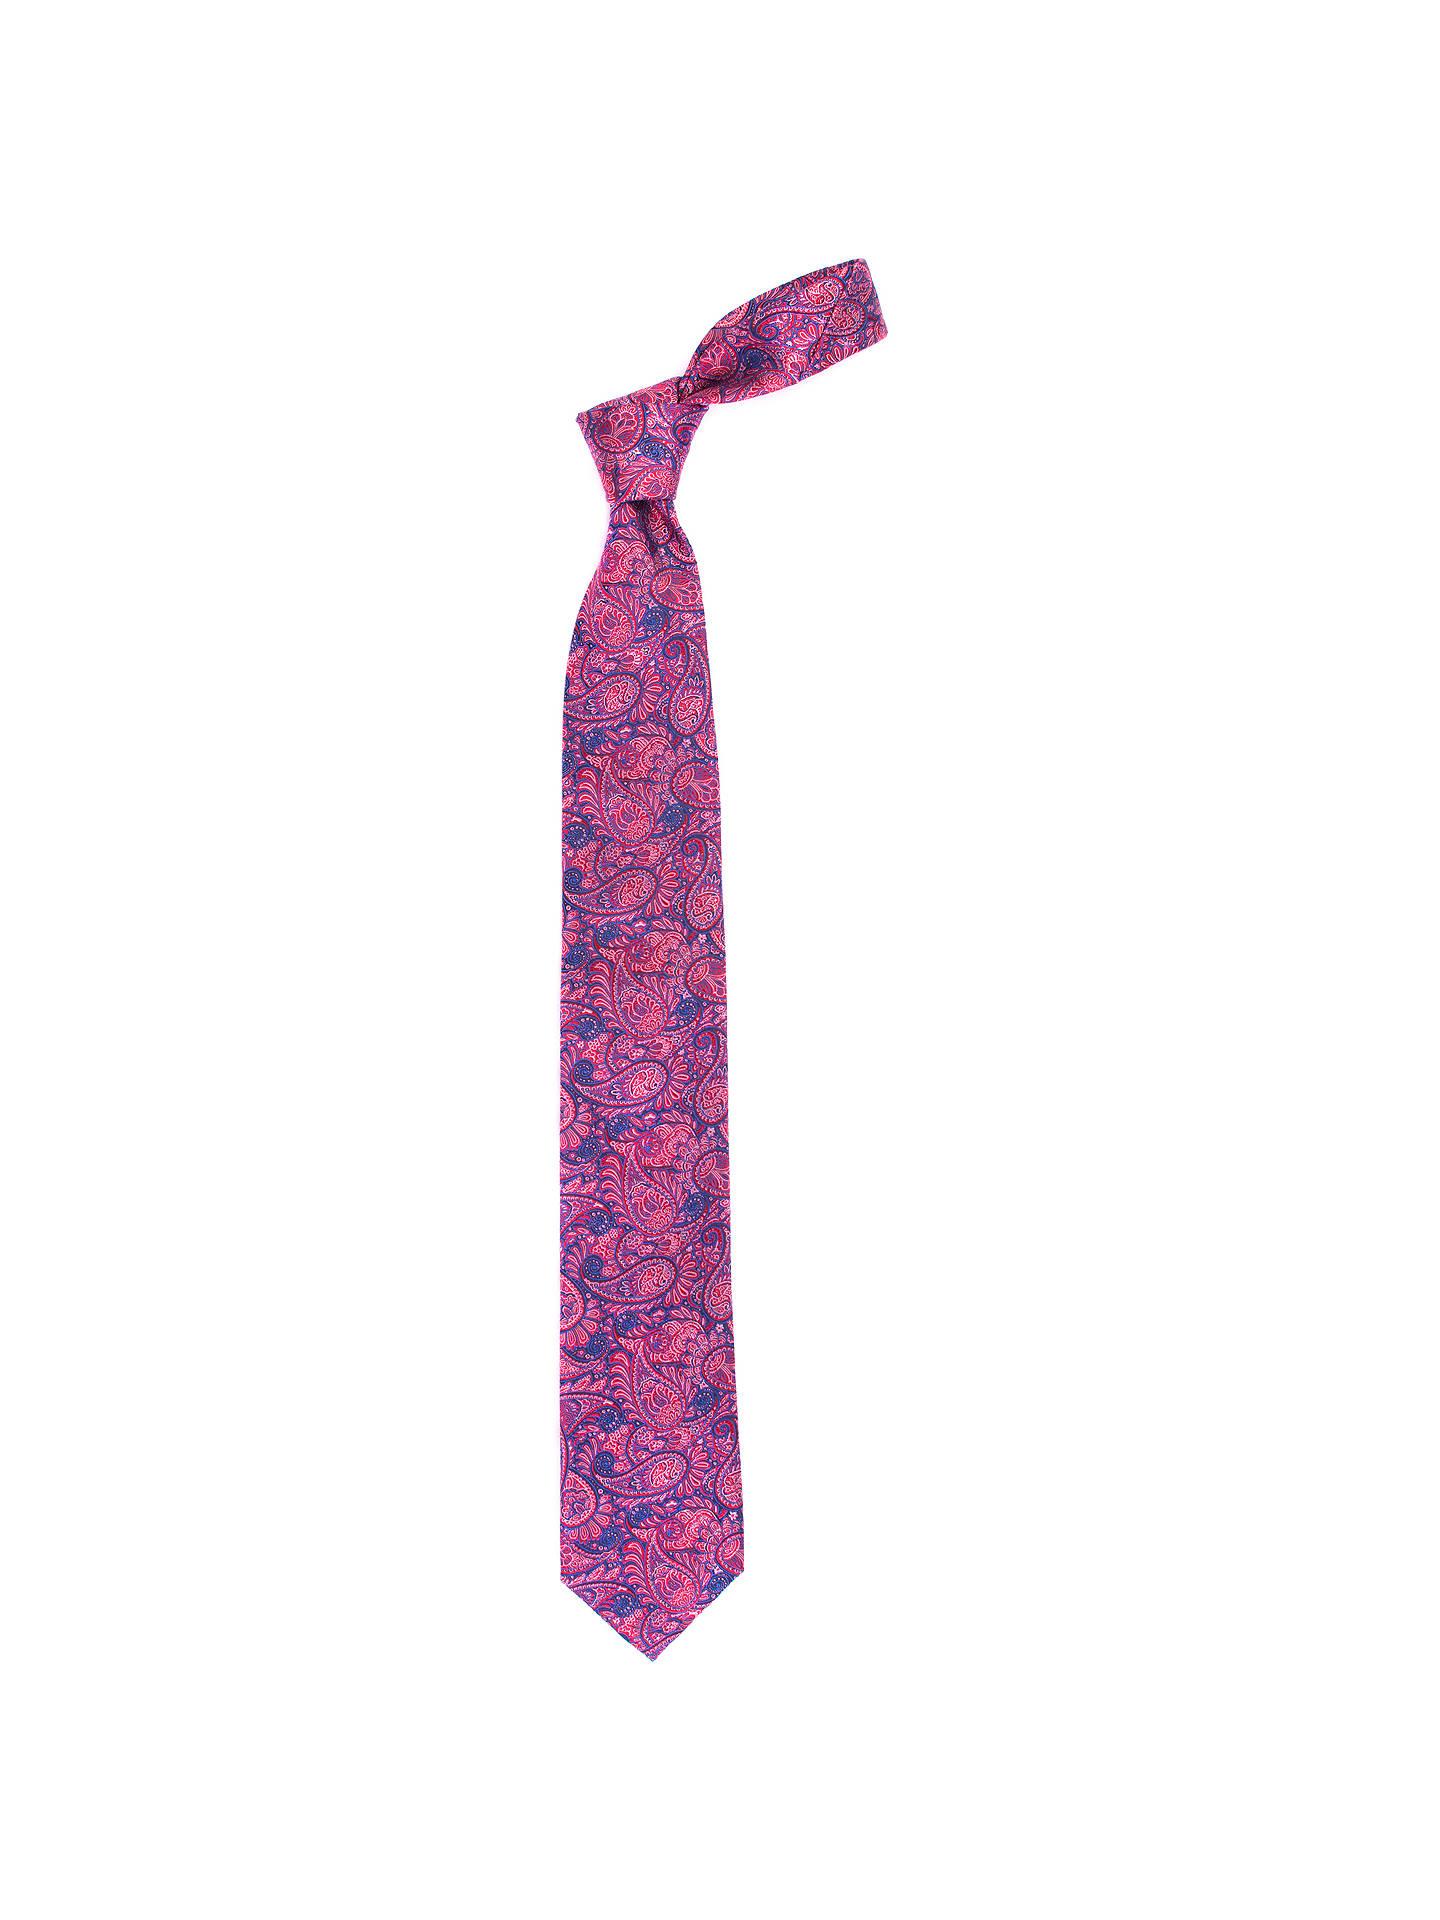 c9c0a03ea9c3 ... Buy John Lewis Intricate Paisley Silk Tie, Pink/Navy Online at  johnlewis.com ...